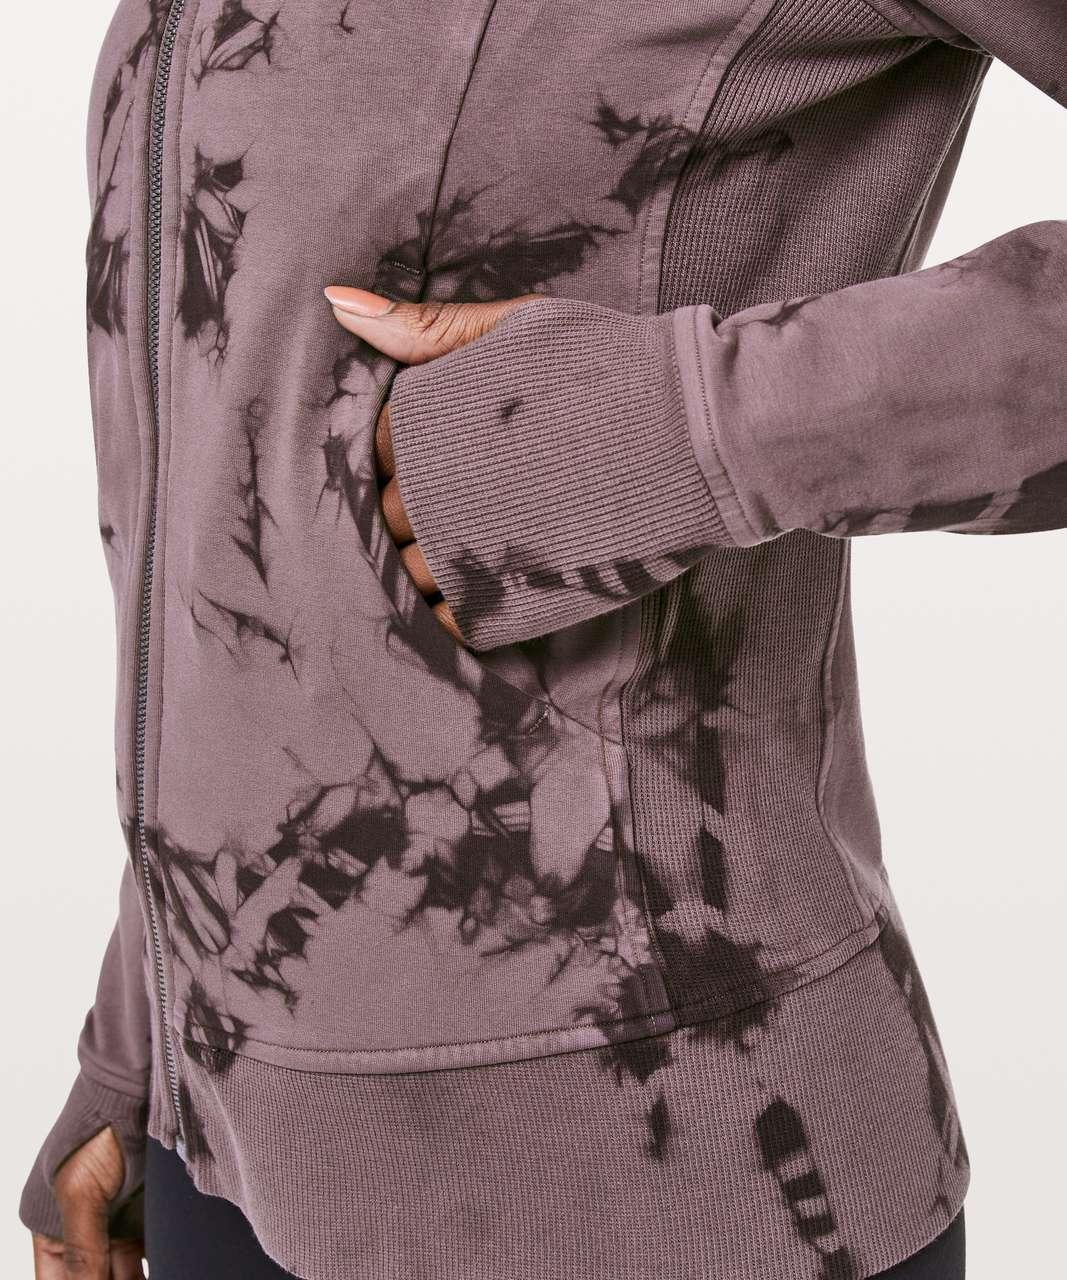 Lululemon Scuba Hoodie *Light Cotton Fleece Shibori - Shibori Antique Bark Black Satin